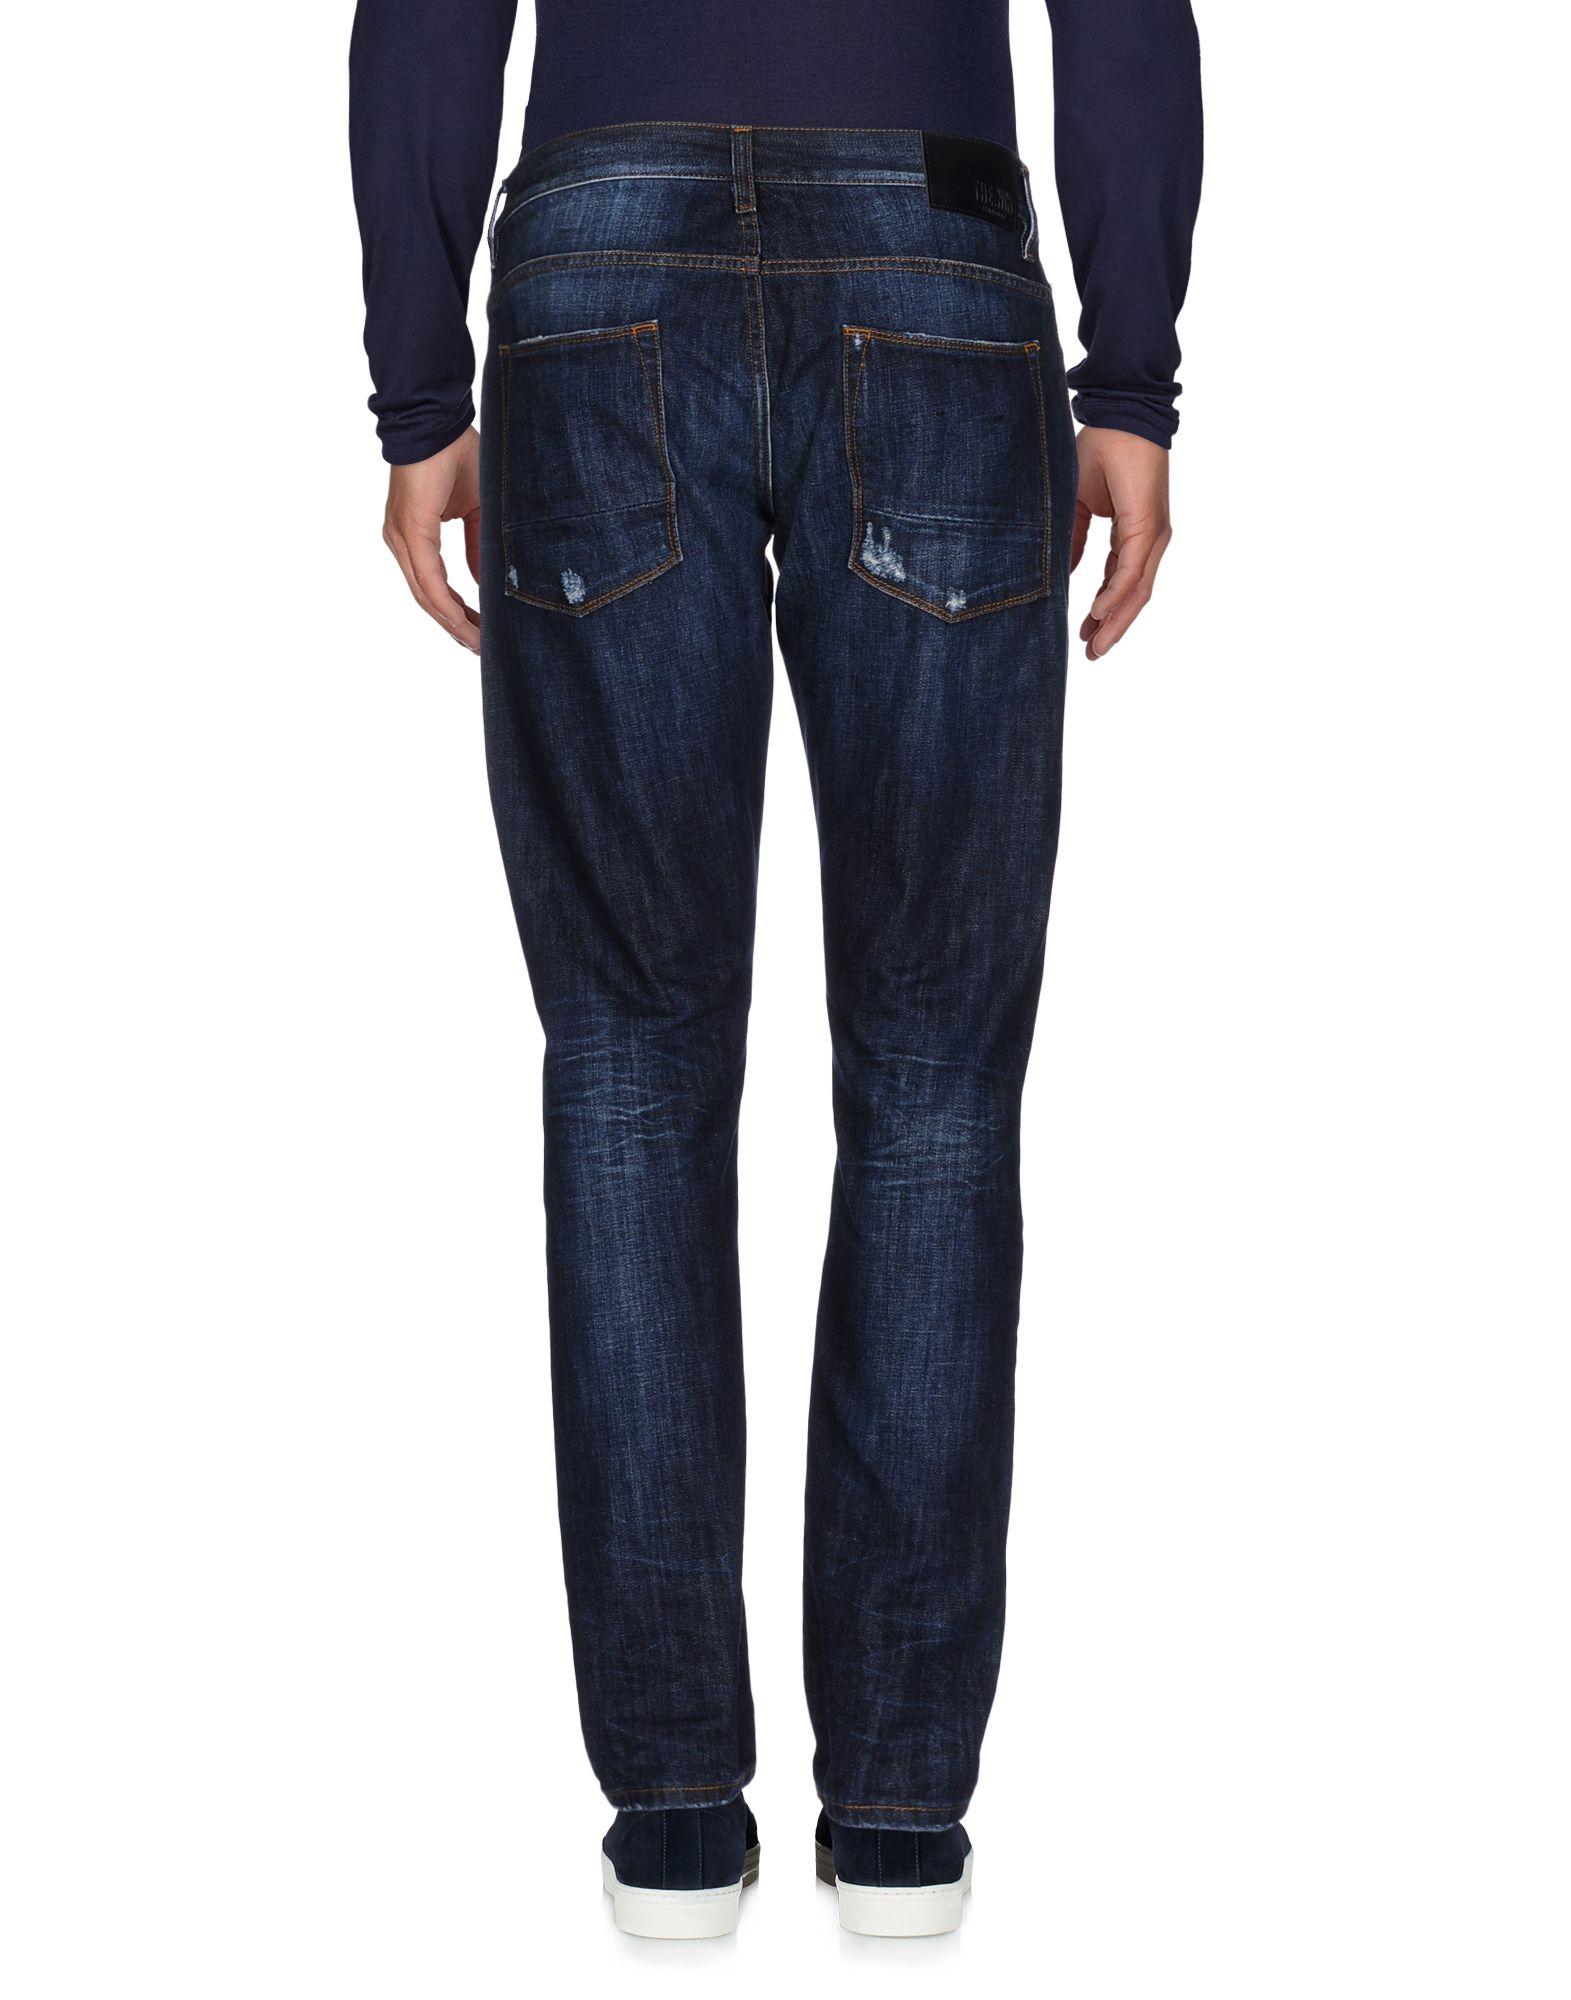 Pantaloni - Jeans The.Nim Uomo - Pantaloni 42583310WU ce30b1